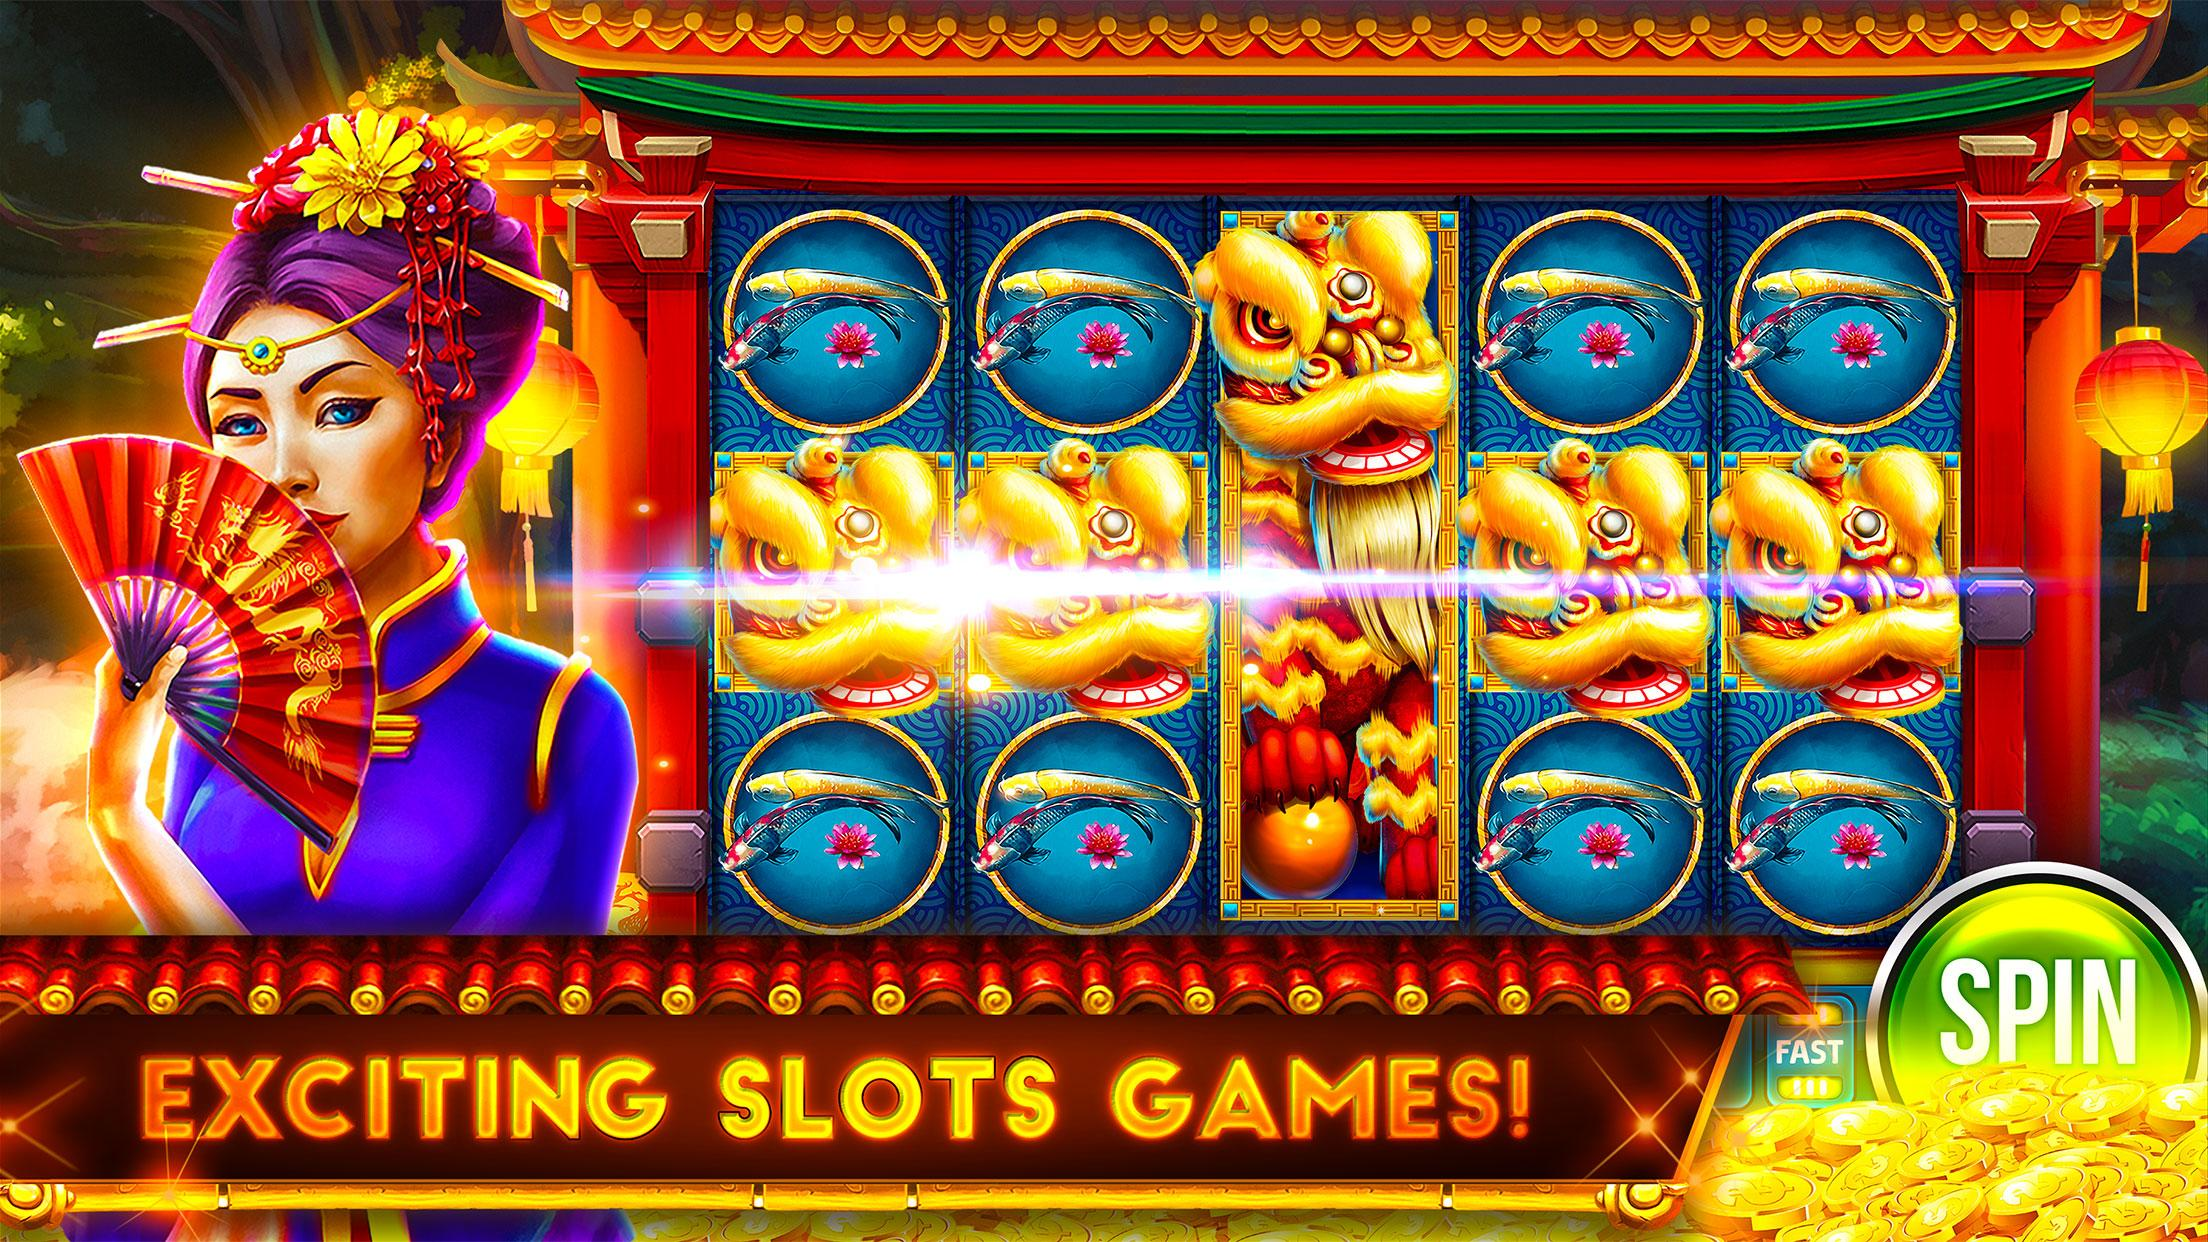 Wallet casino free credit